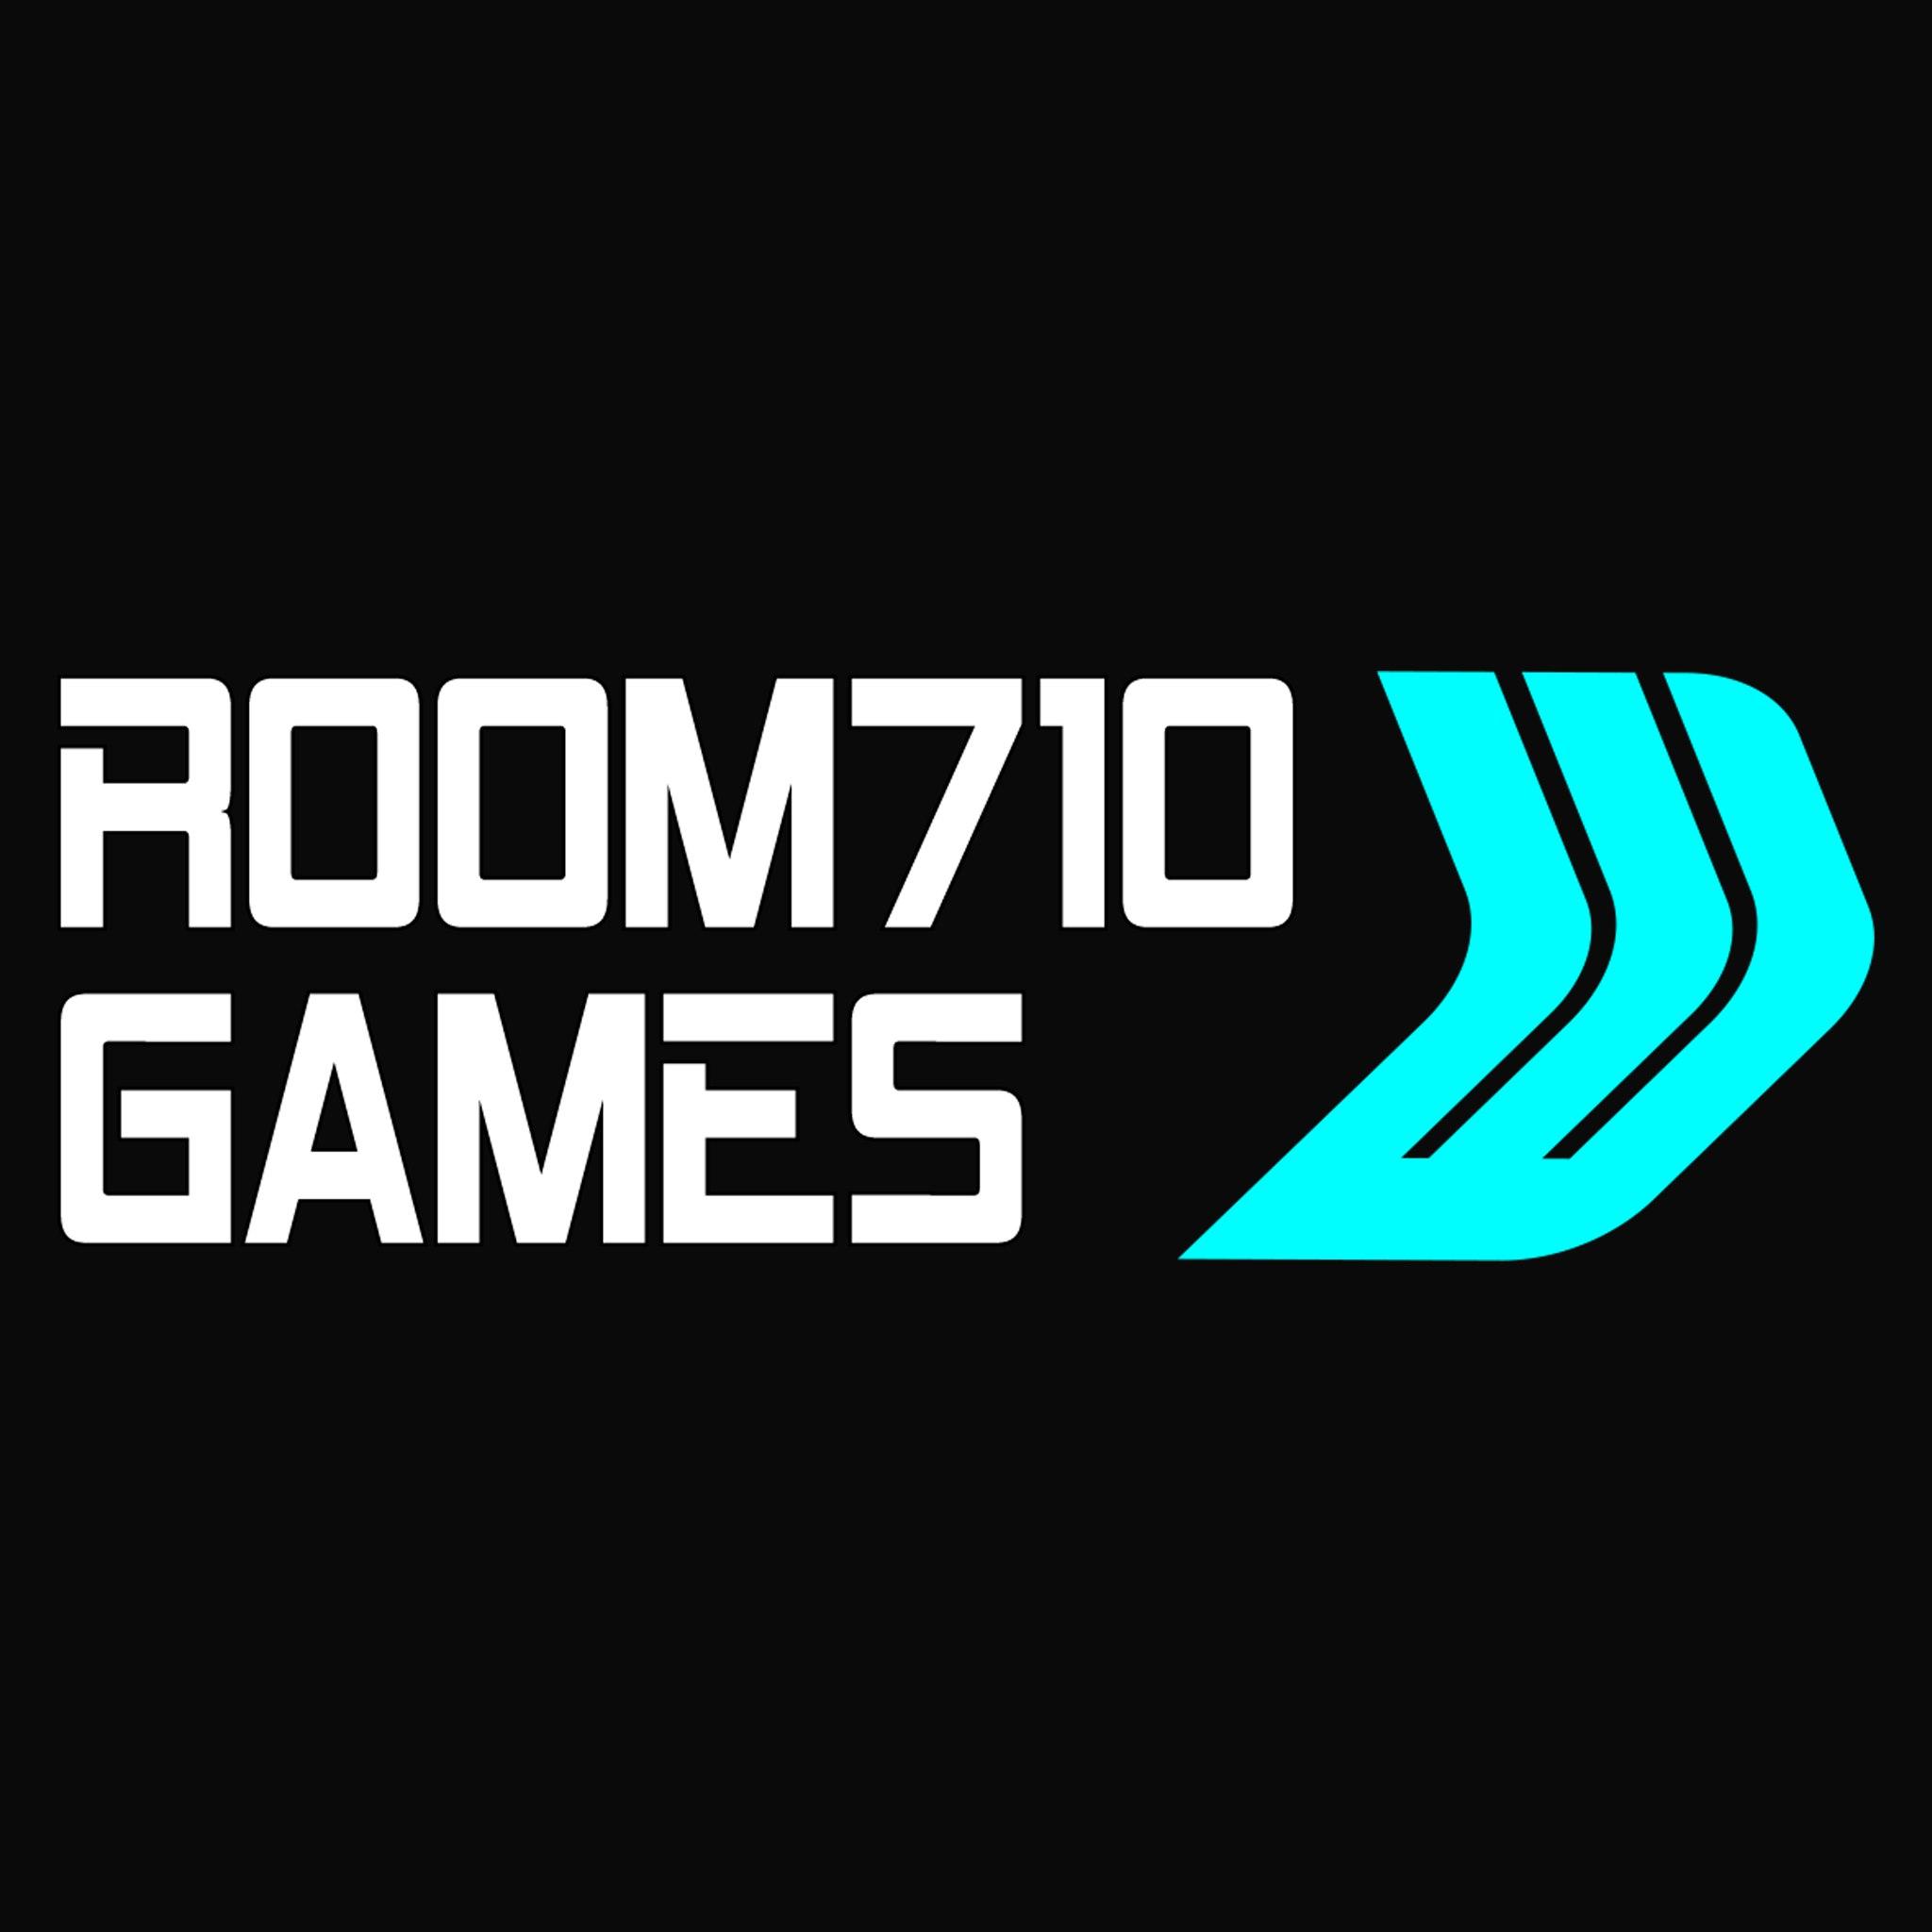 Room710Games